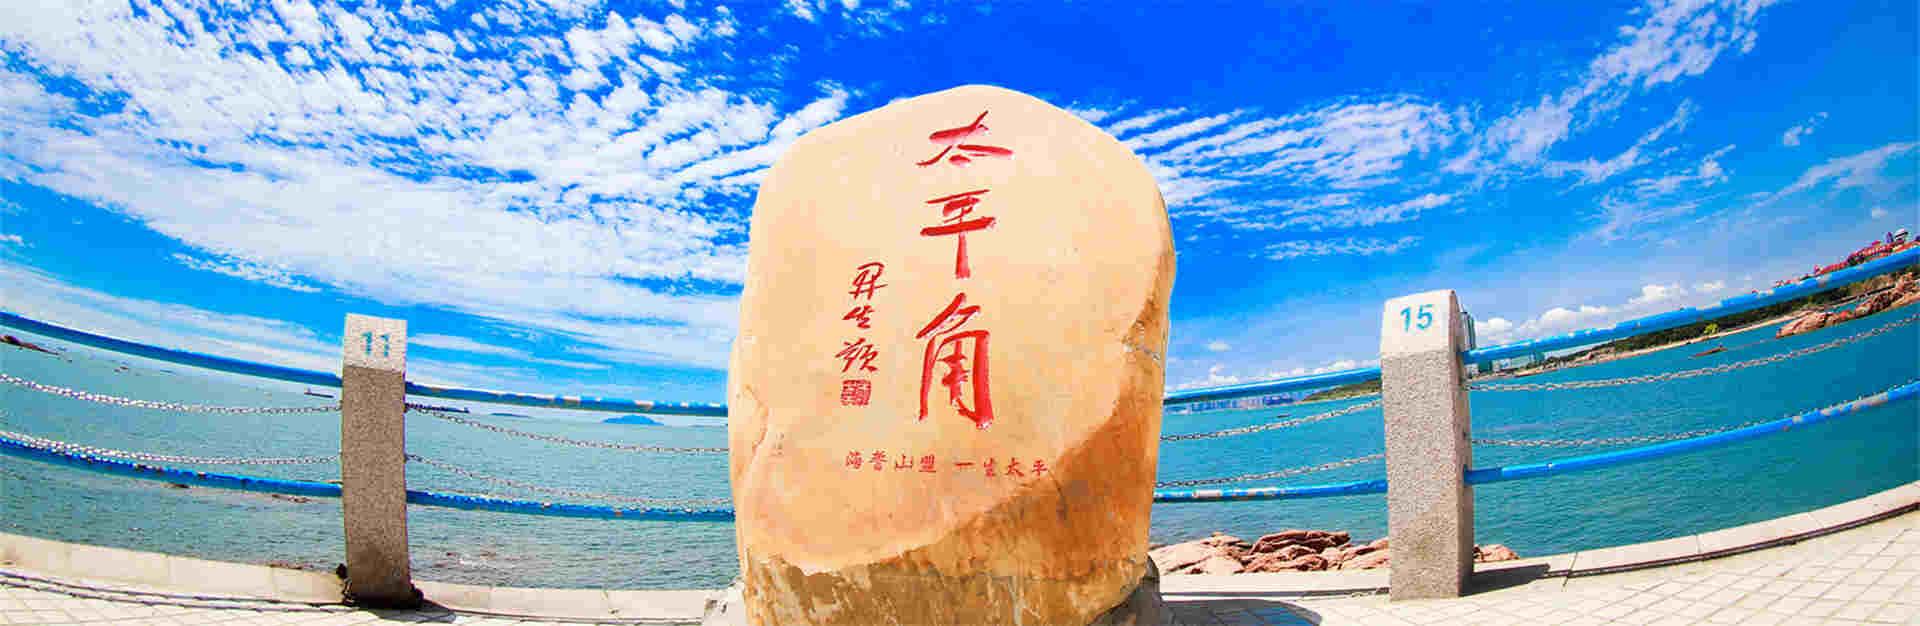 Stunning Taipingjiao beach receives visitors